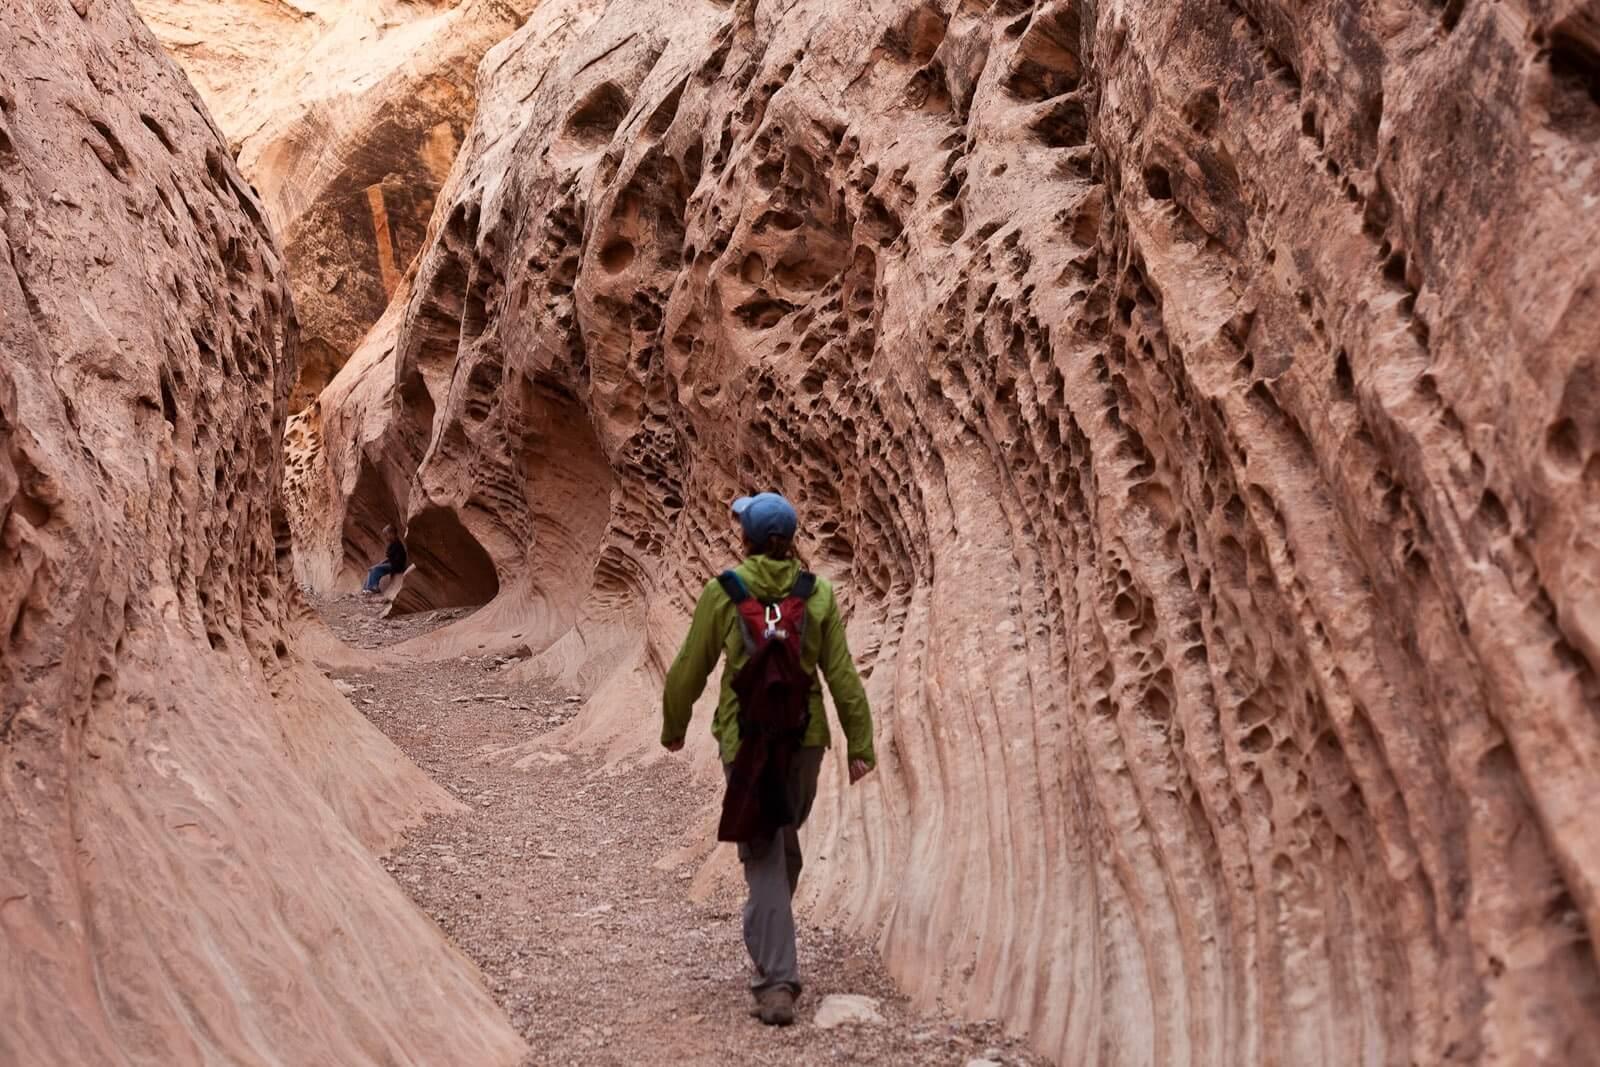 banner-little-wild-horse-slot-canyon